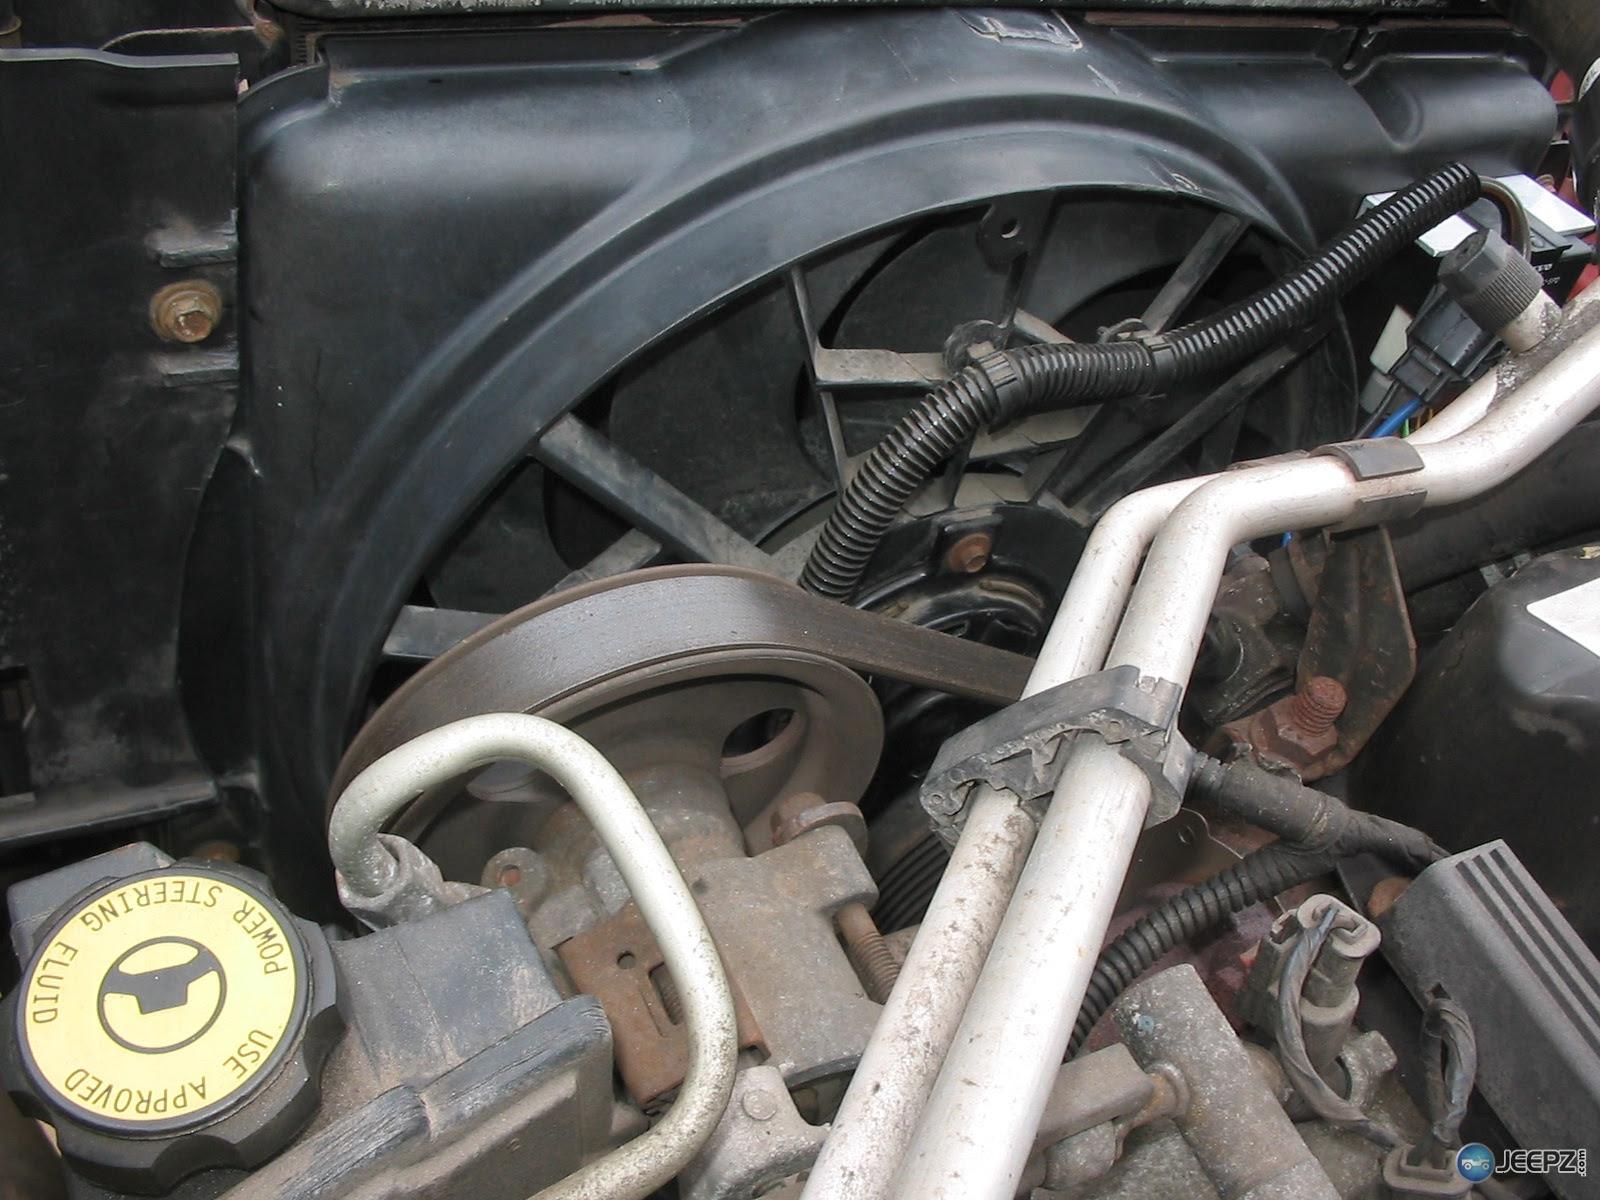 07 jeep liberty wiring diagram image 8